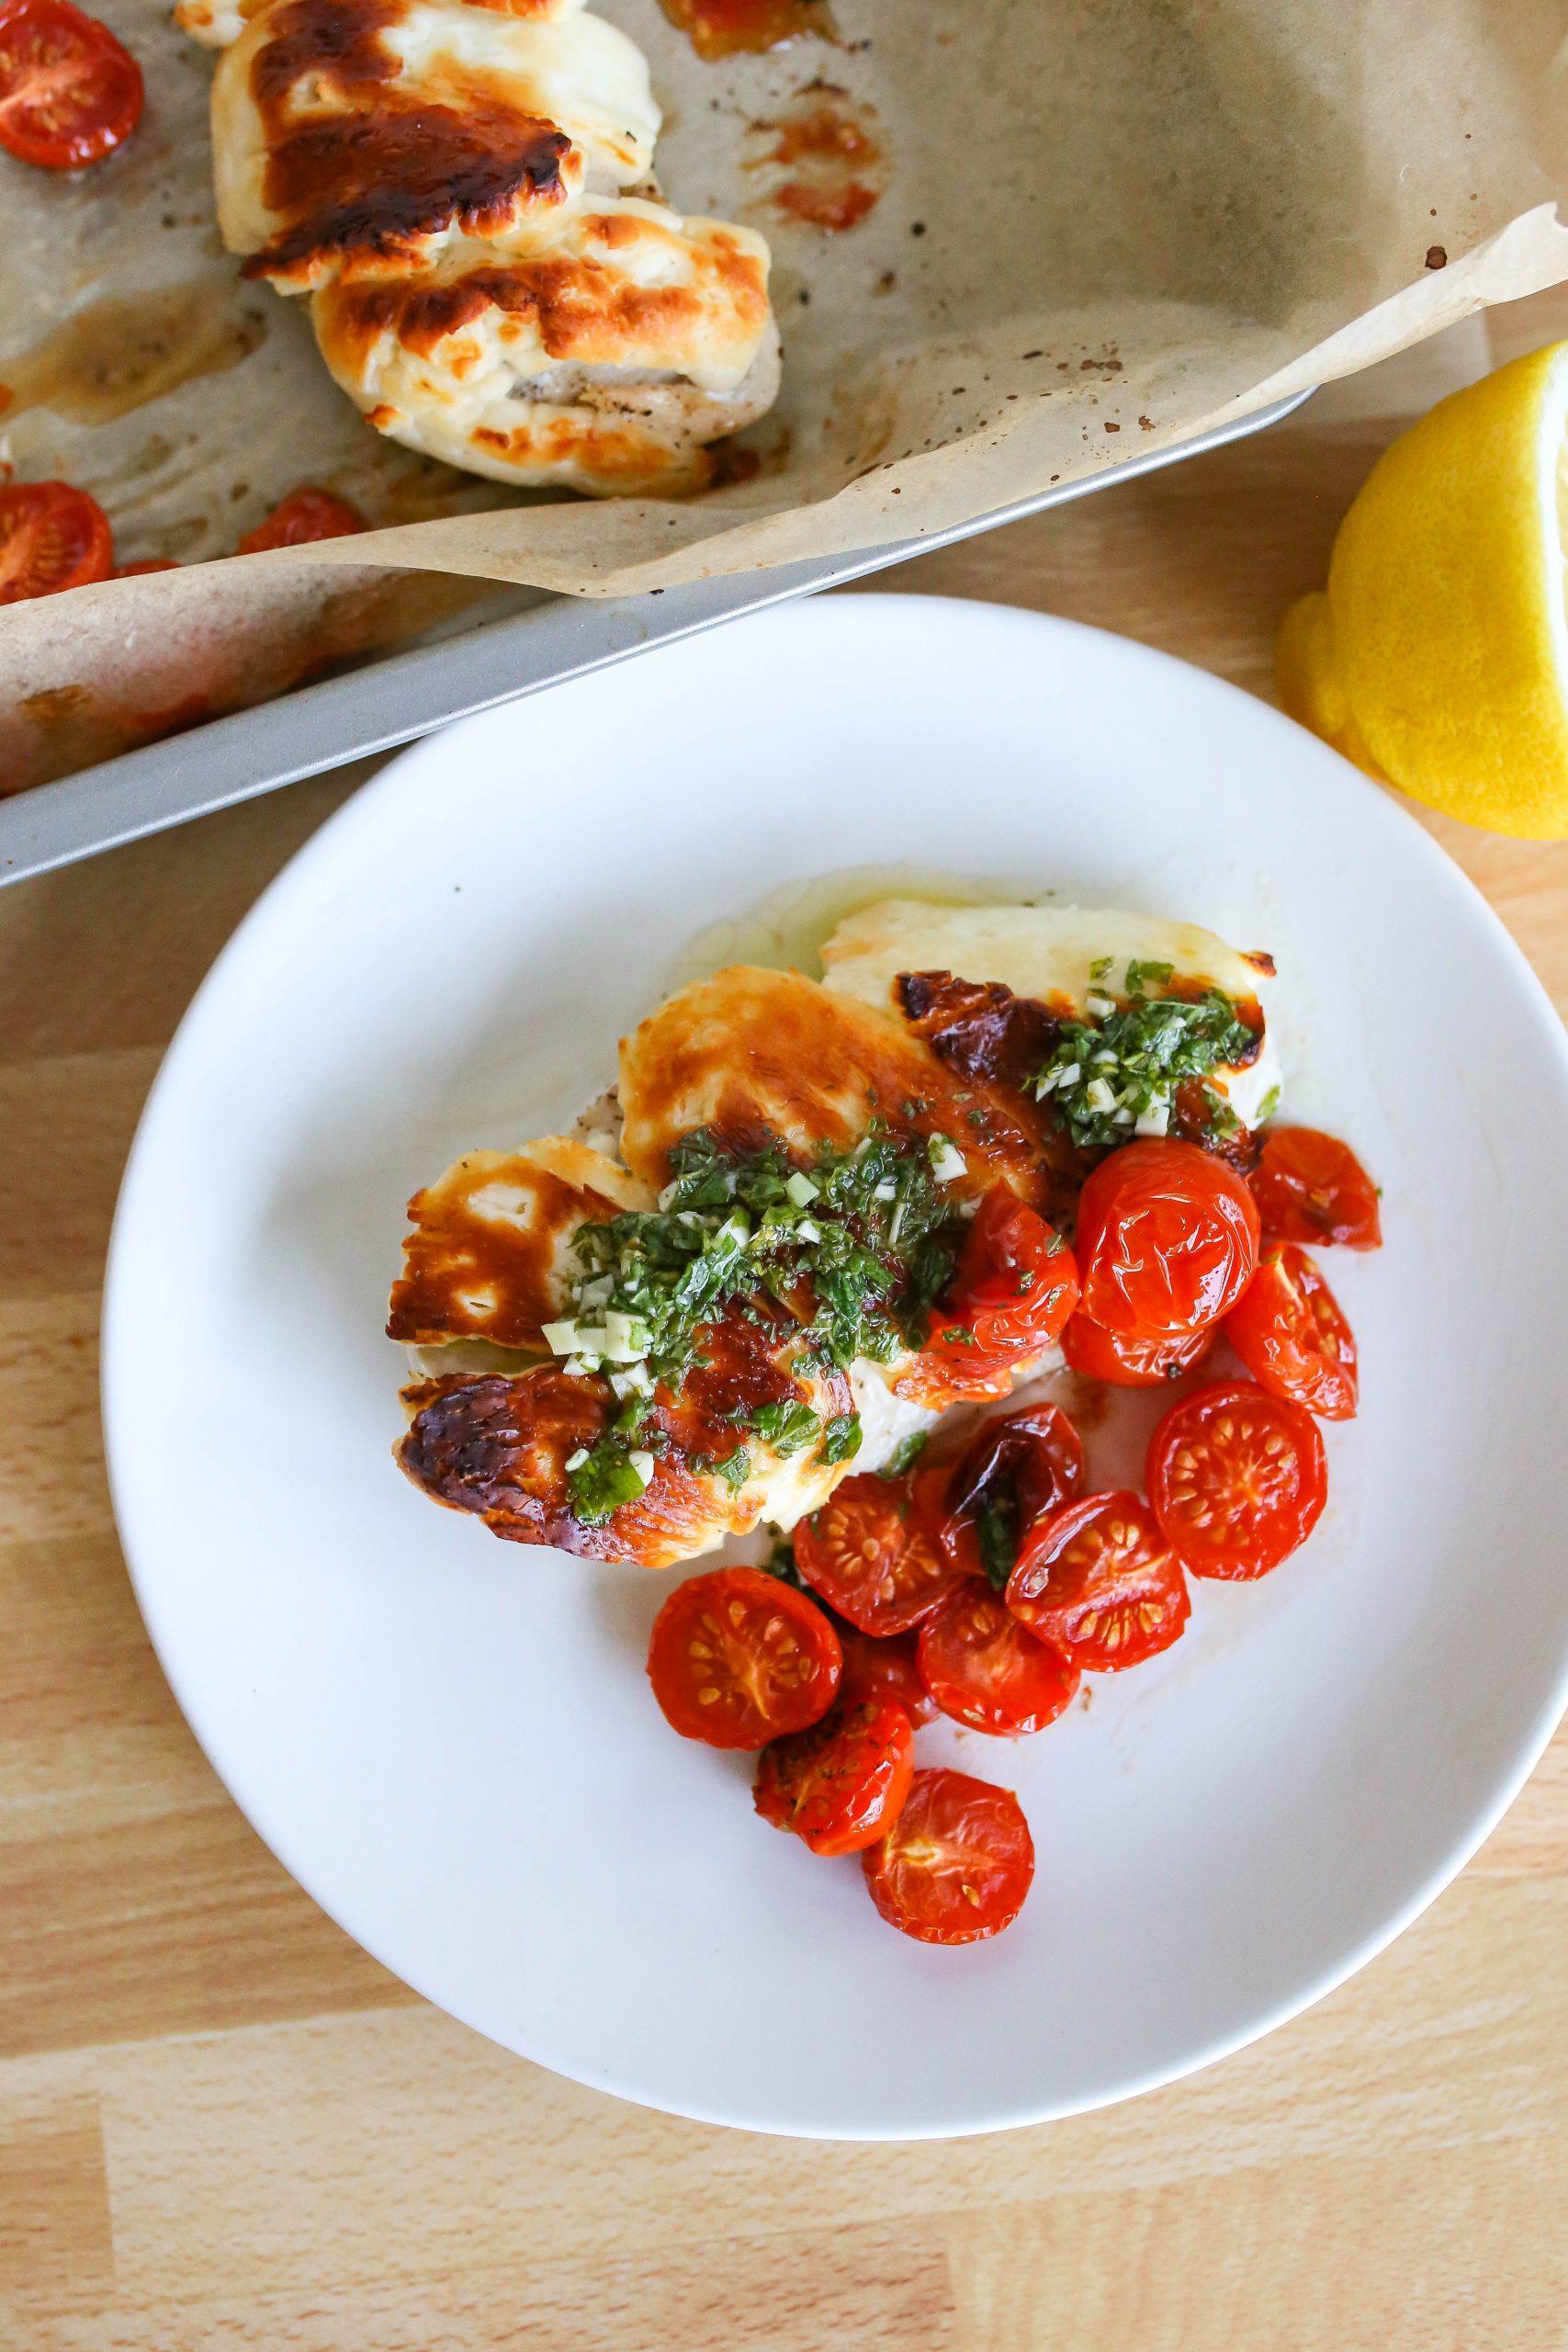 LSL Weekly Meal Plan #19